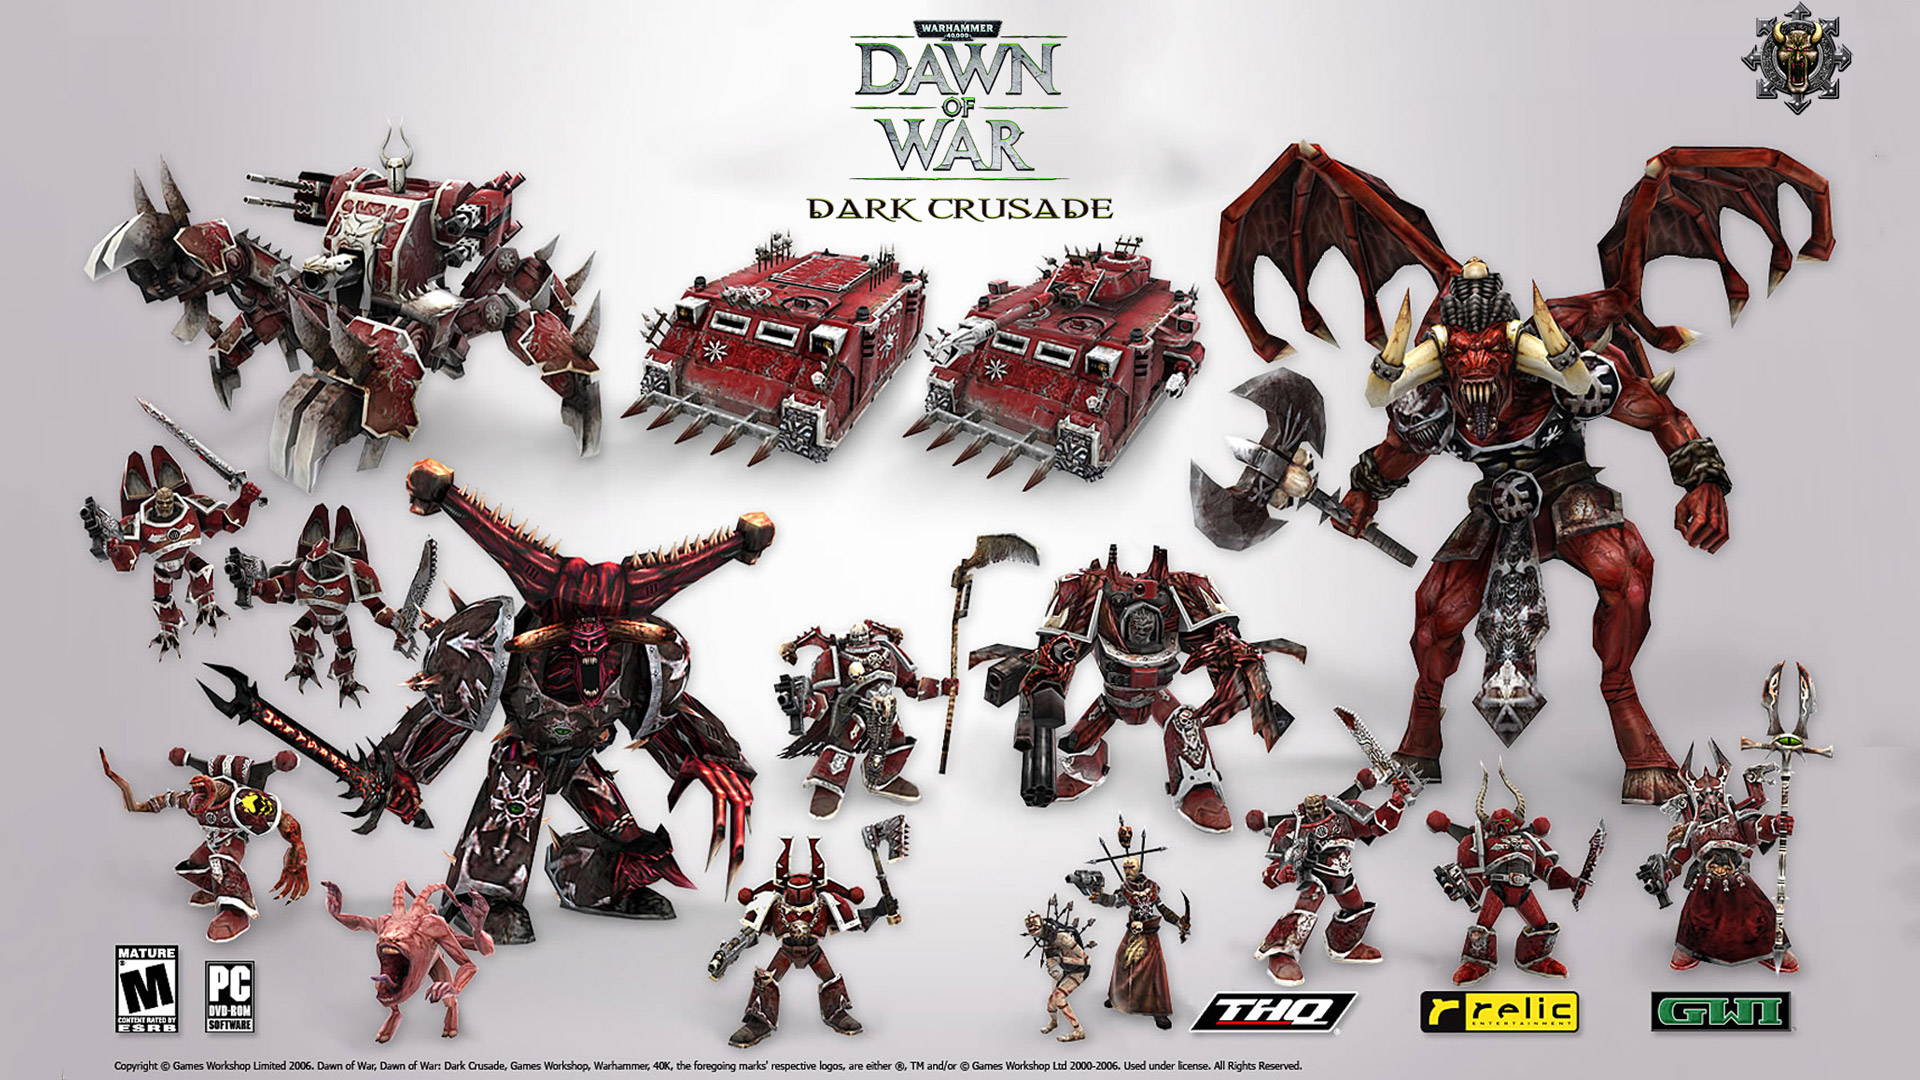 Free Warhammer 40000: Dawn of War Wallpaper in 1920x1080